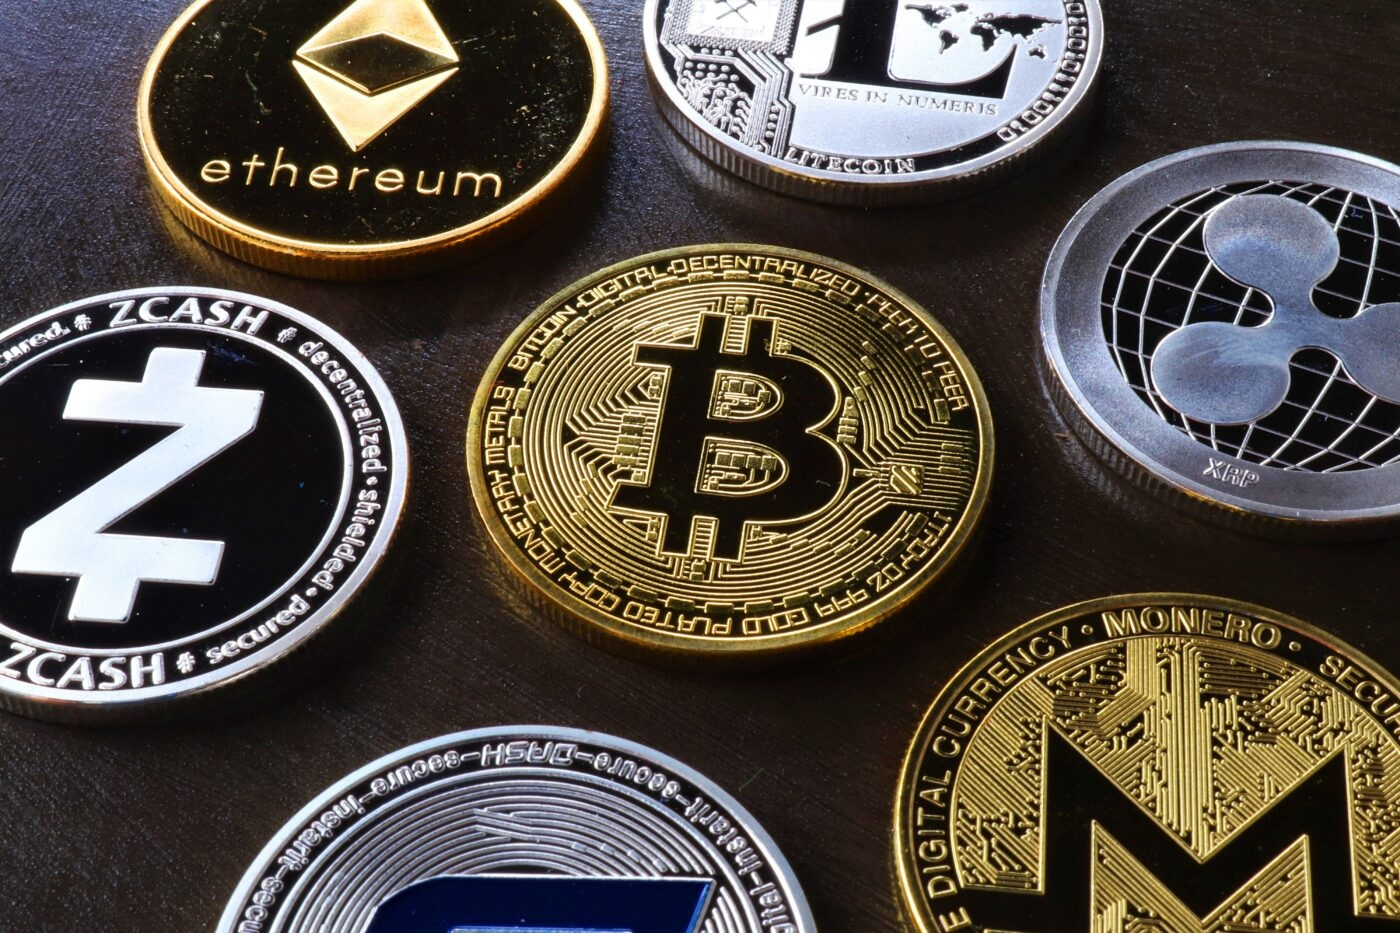 Krypto-Aktien fallen in Hongkong, Bitcoin beginnt sich zu stabilisieren